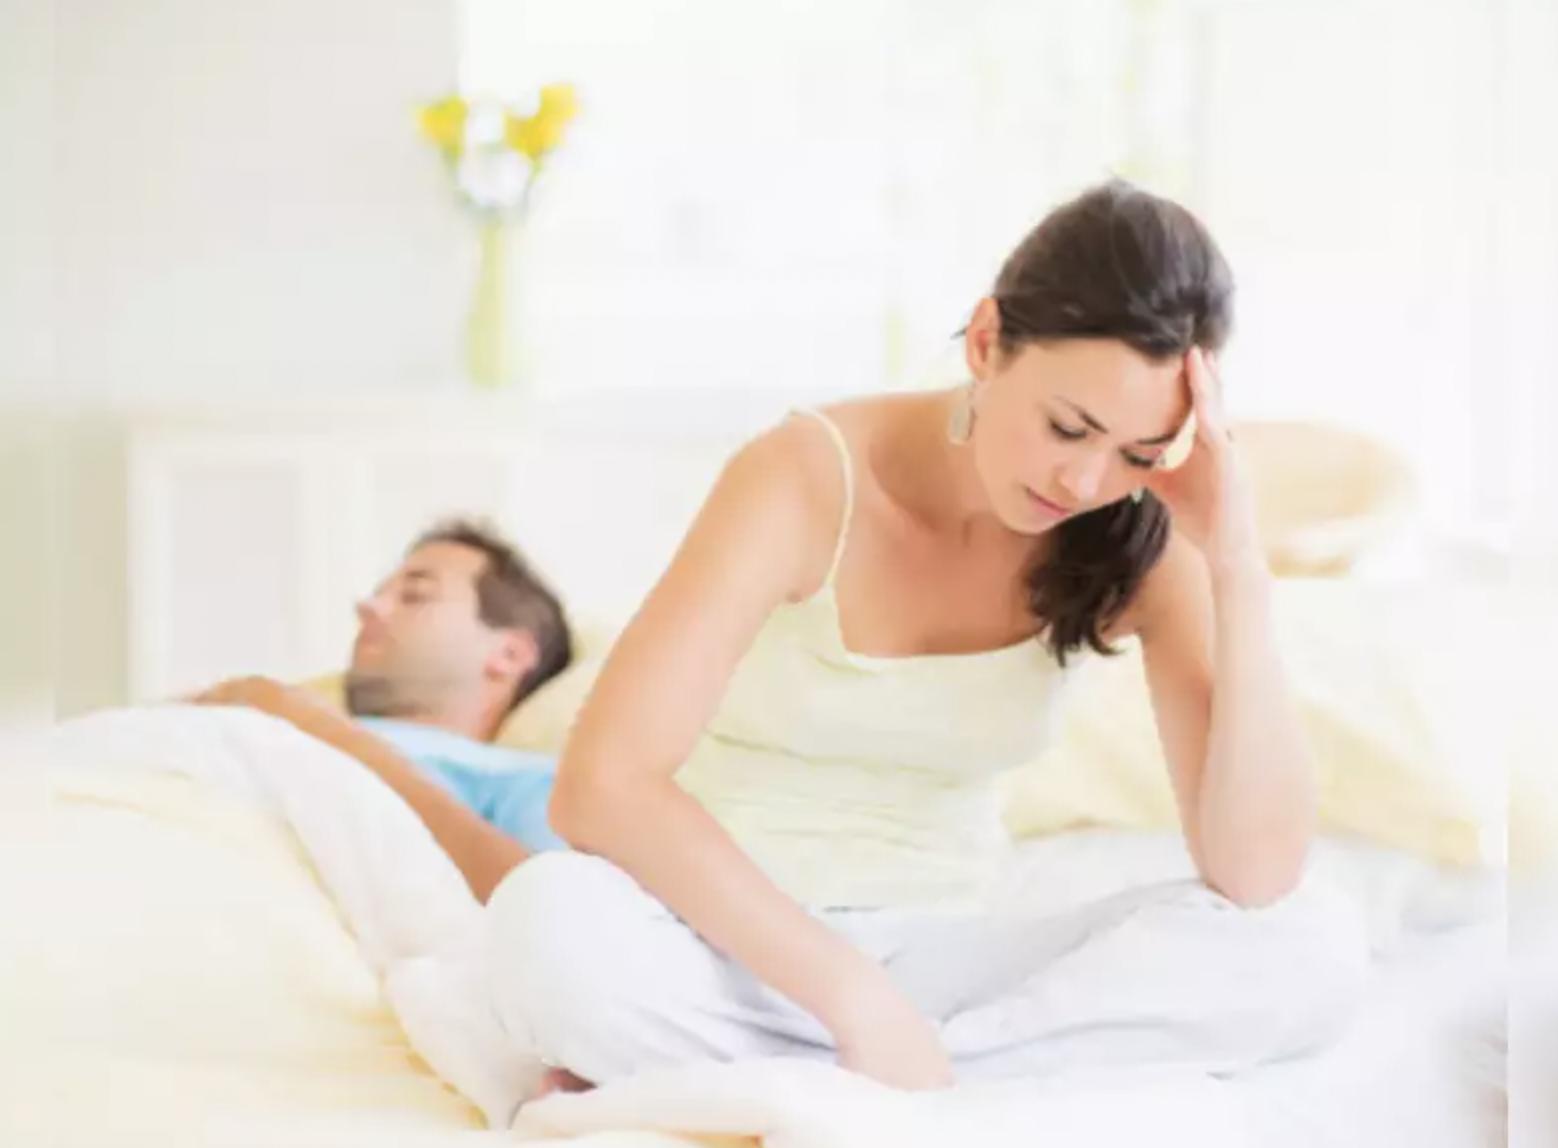 7 Causes behind Low Sex Drive in Men